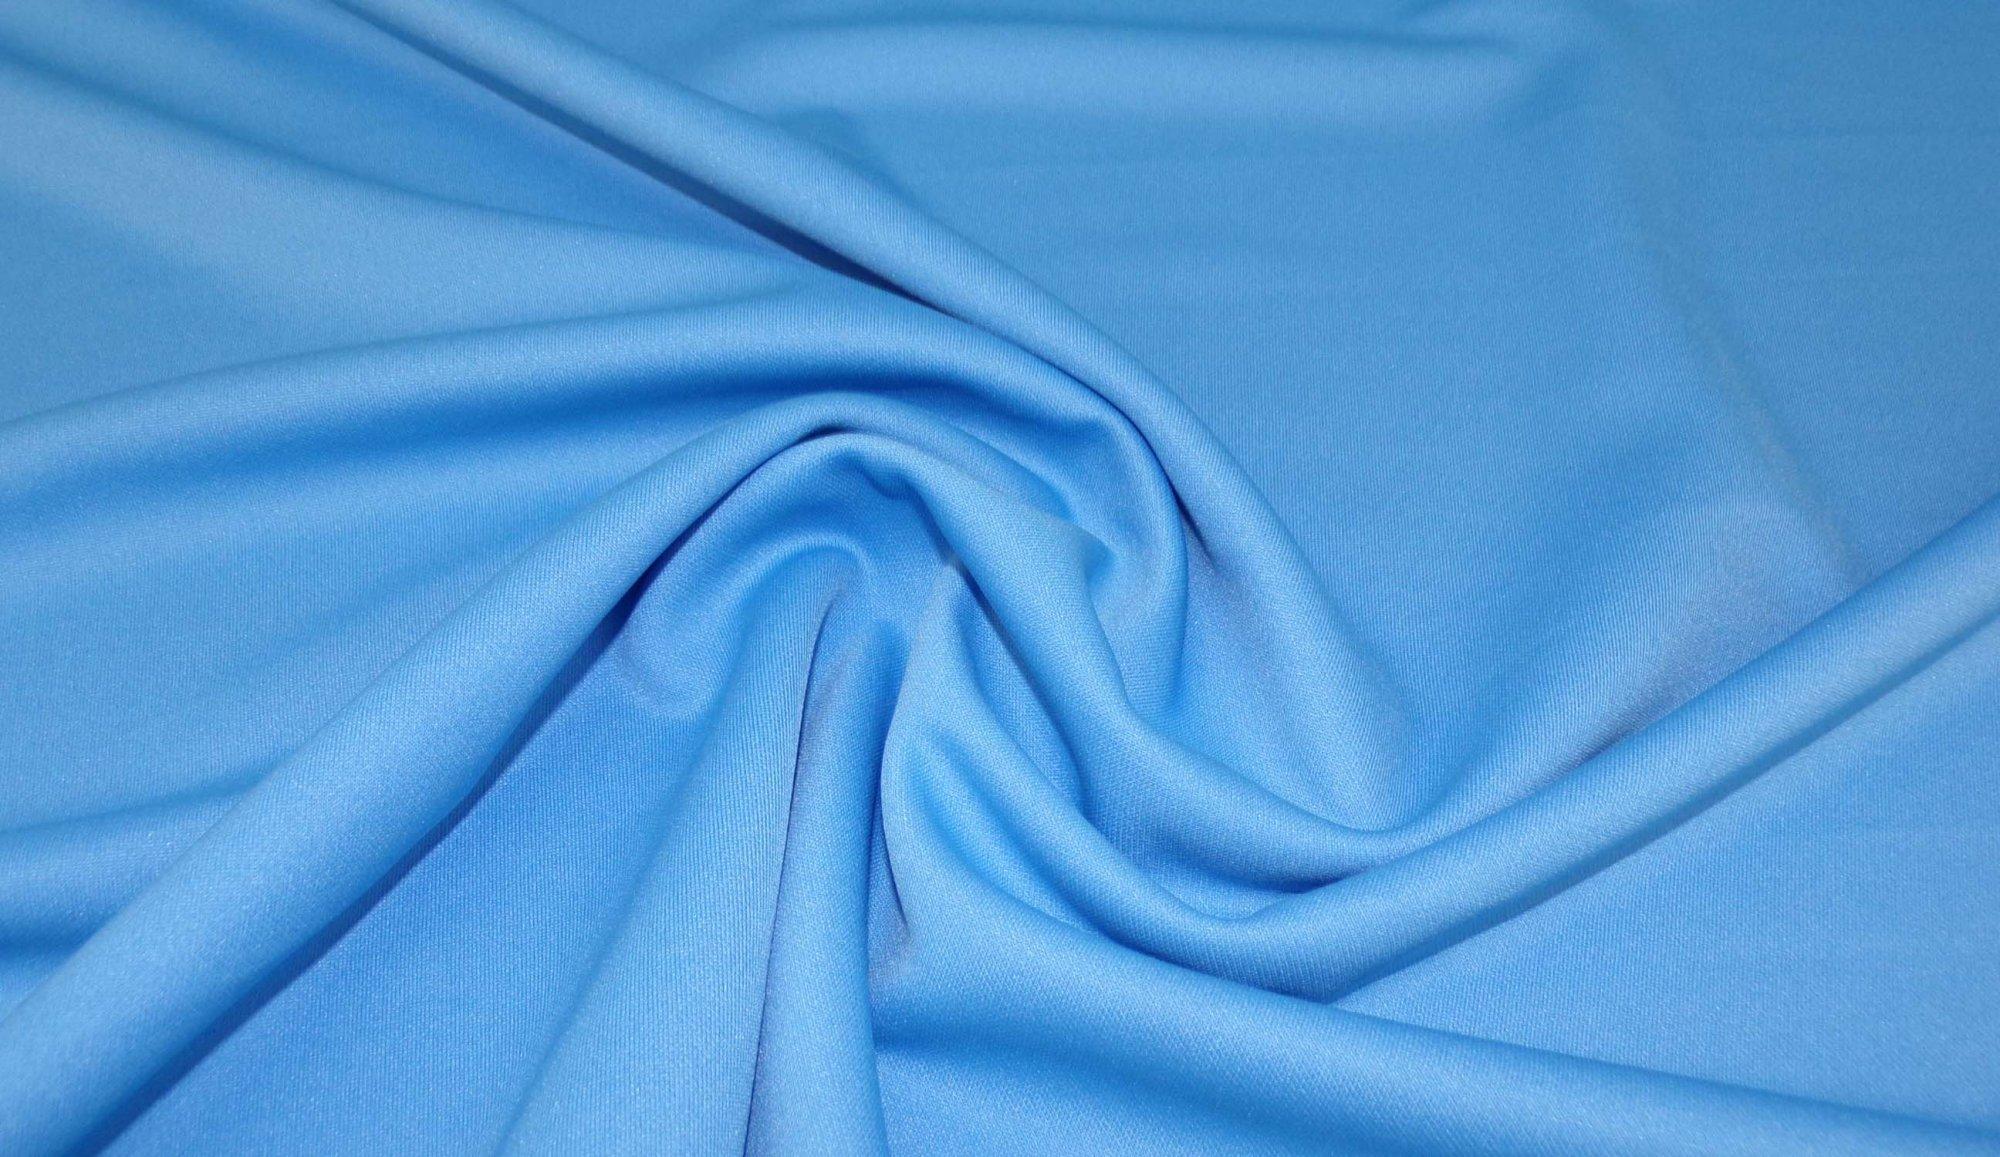 Blue Ponte (Scuba) Knit - 8 oz - 60in